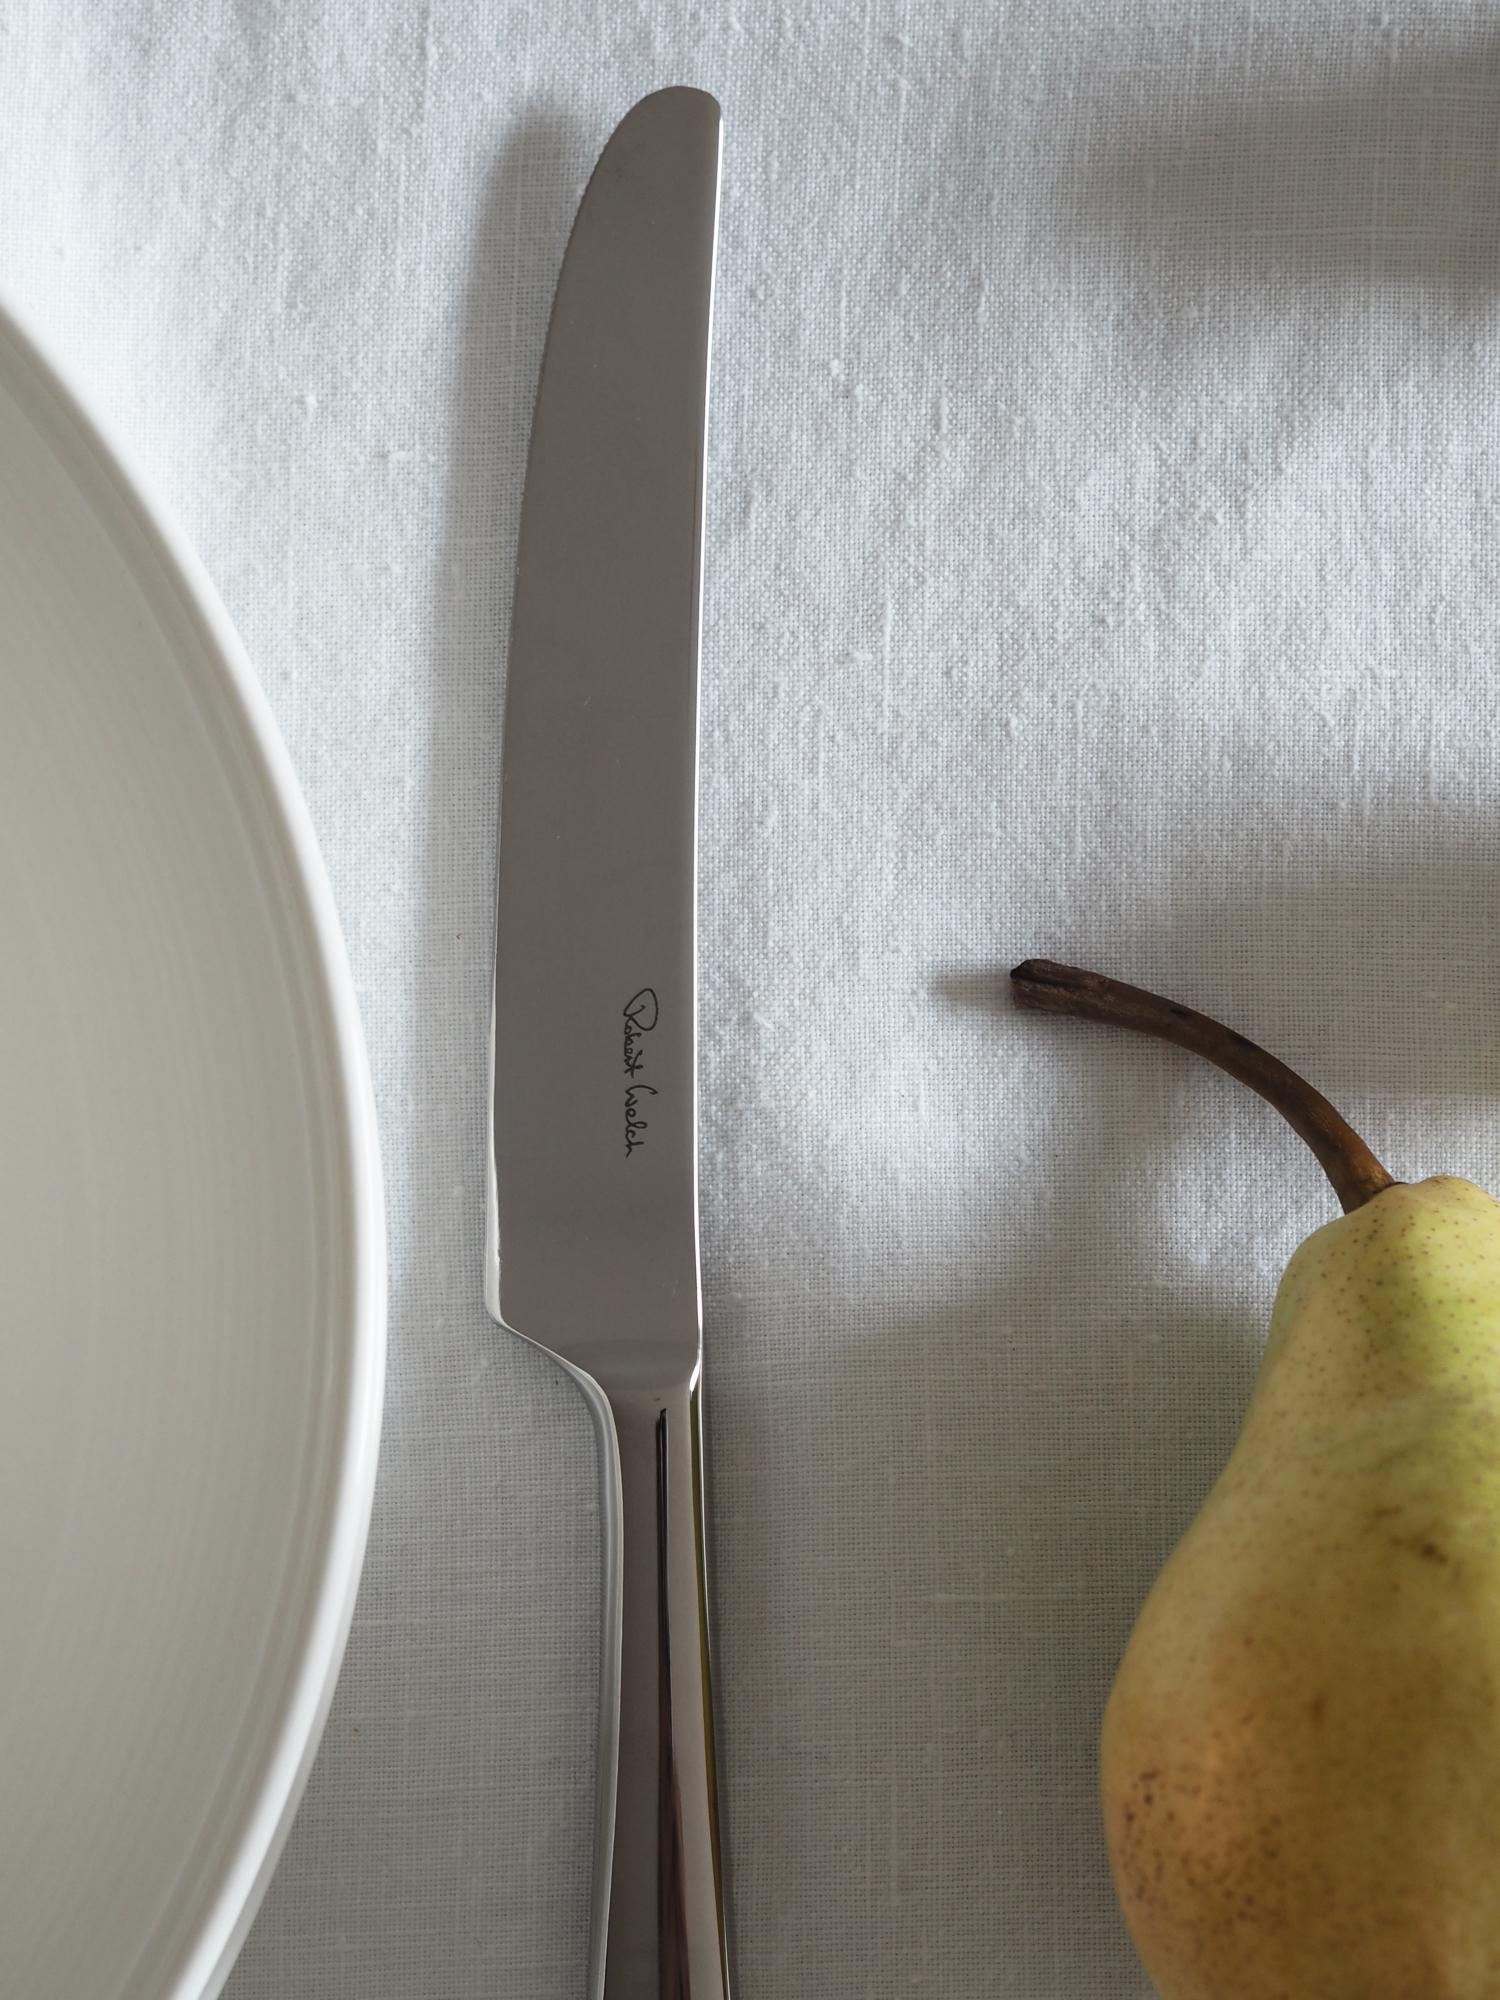 Robert Welch Malvern cutlery | Design  Hunter